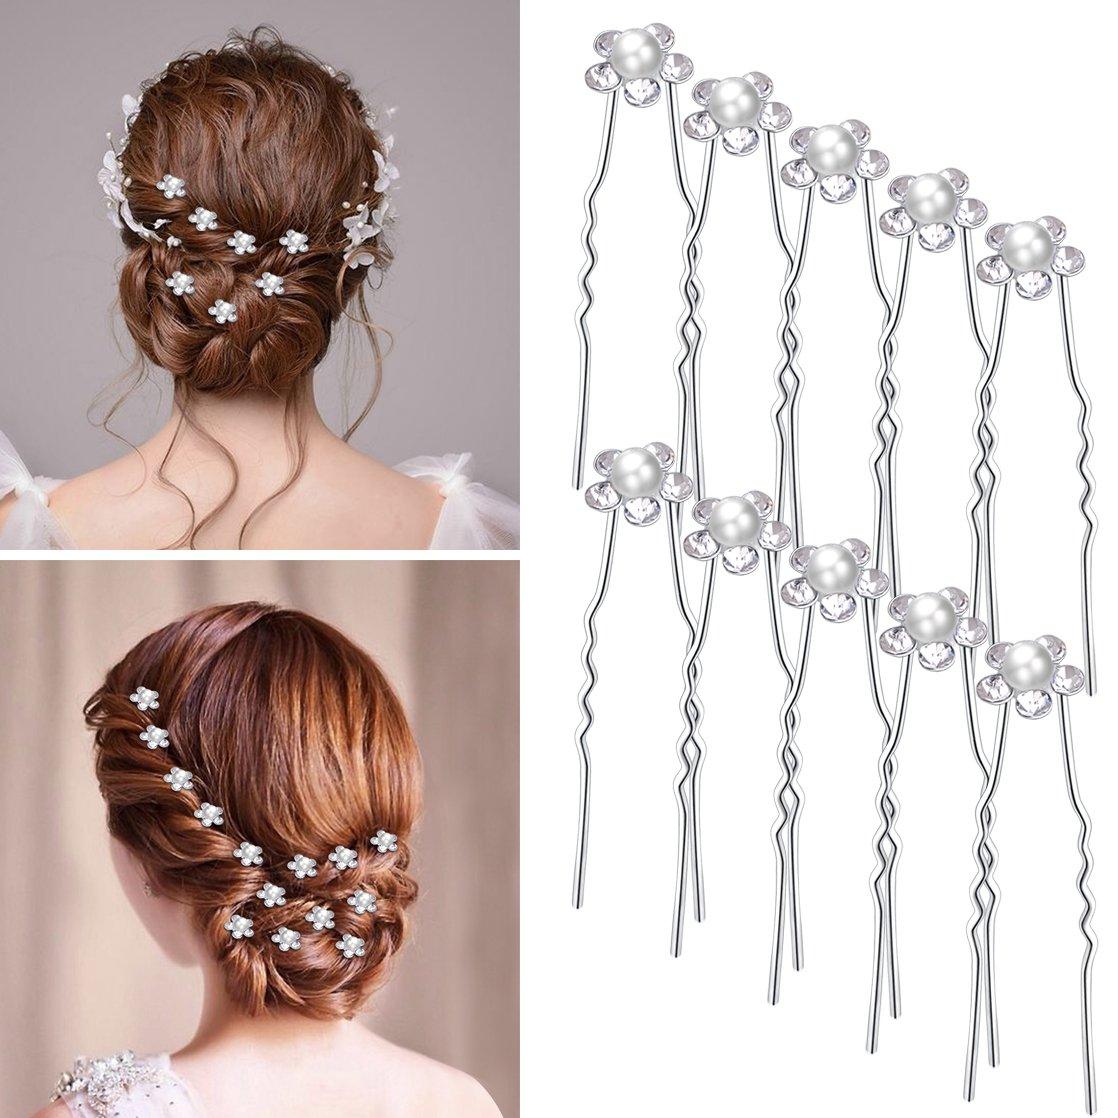 Amazon.com : Dxhycc 20pcs Bridal Hair Pins Pearl Flower Crystal ...